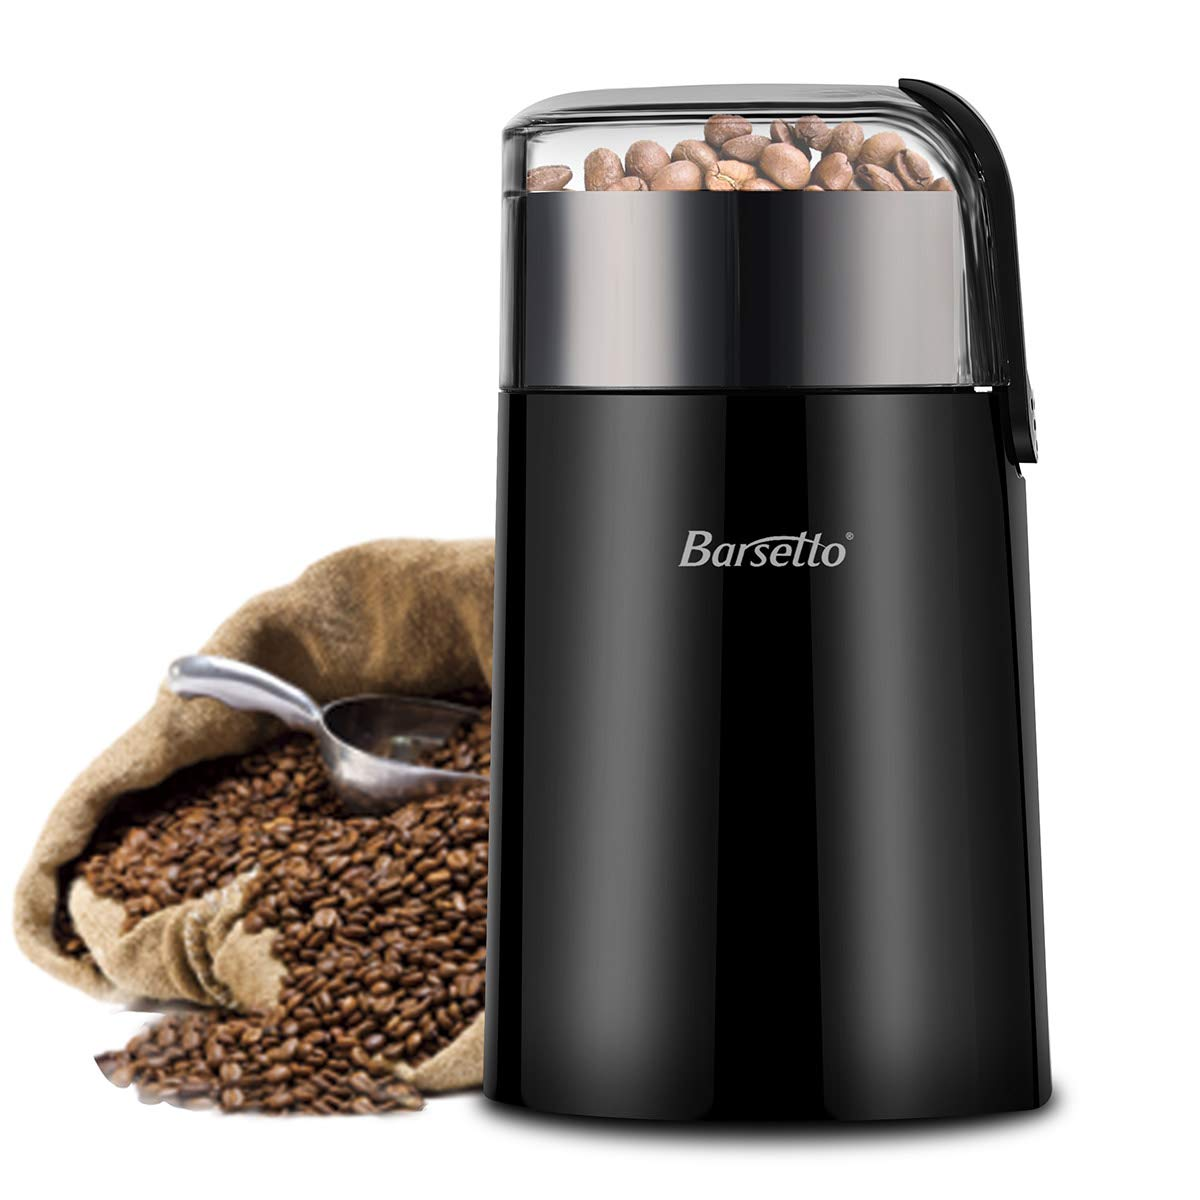 Kaffeemühle Barsetto Elektrische One-Touch HyperGrind Precision Edelstahlklingenmühle